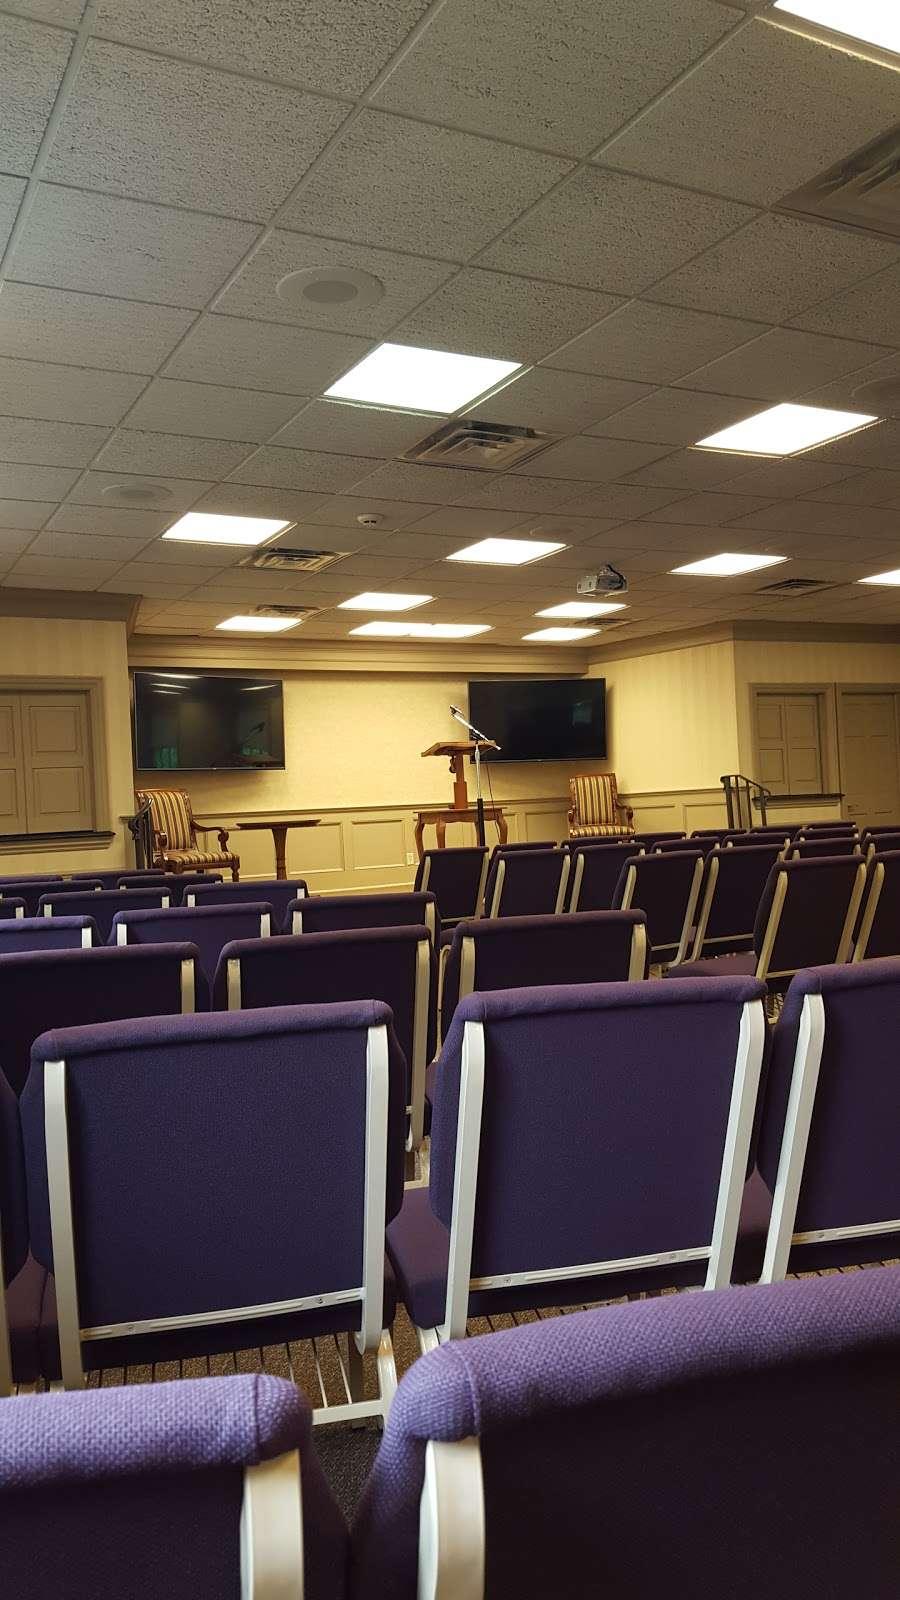 Kingdom Hall of Jehovahs Witnesses - church  | Photo 1 of 2 | Address: 10 Norwood Dr, Gillette, NJ 07933, USA | Phone: (908) 647-1197